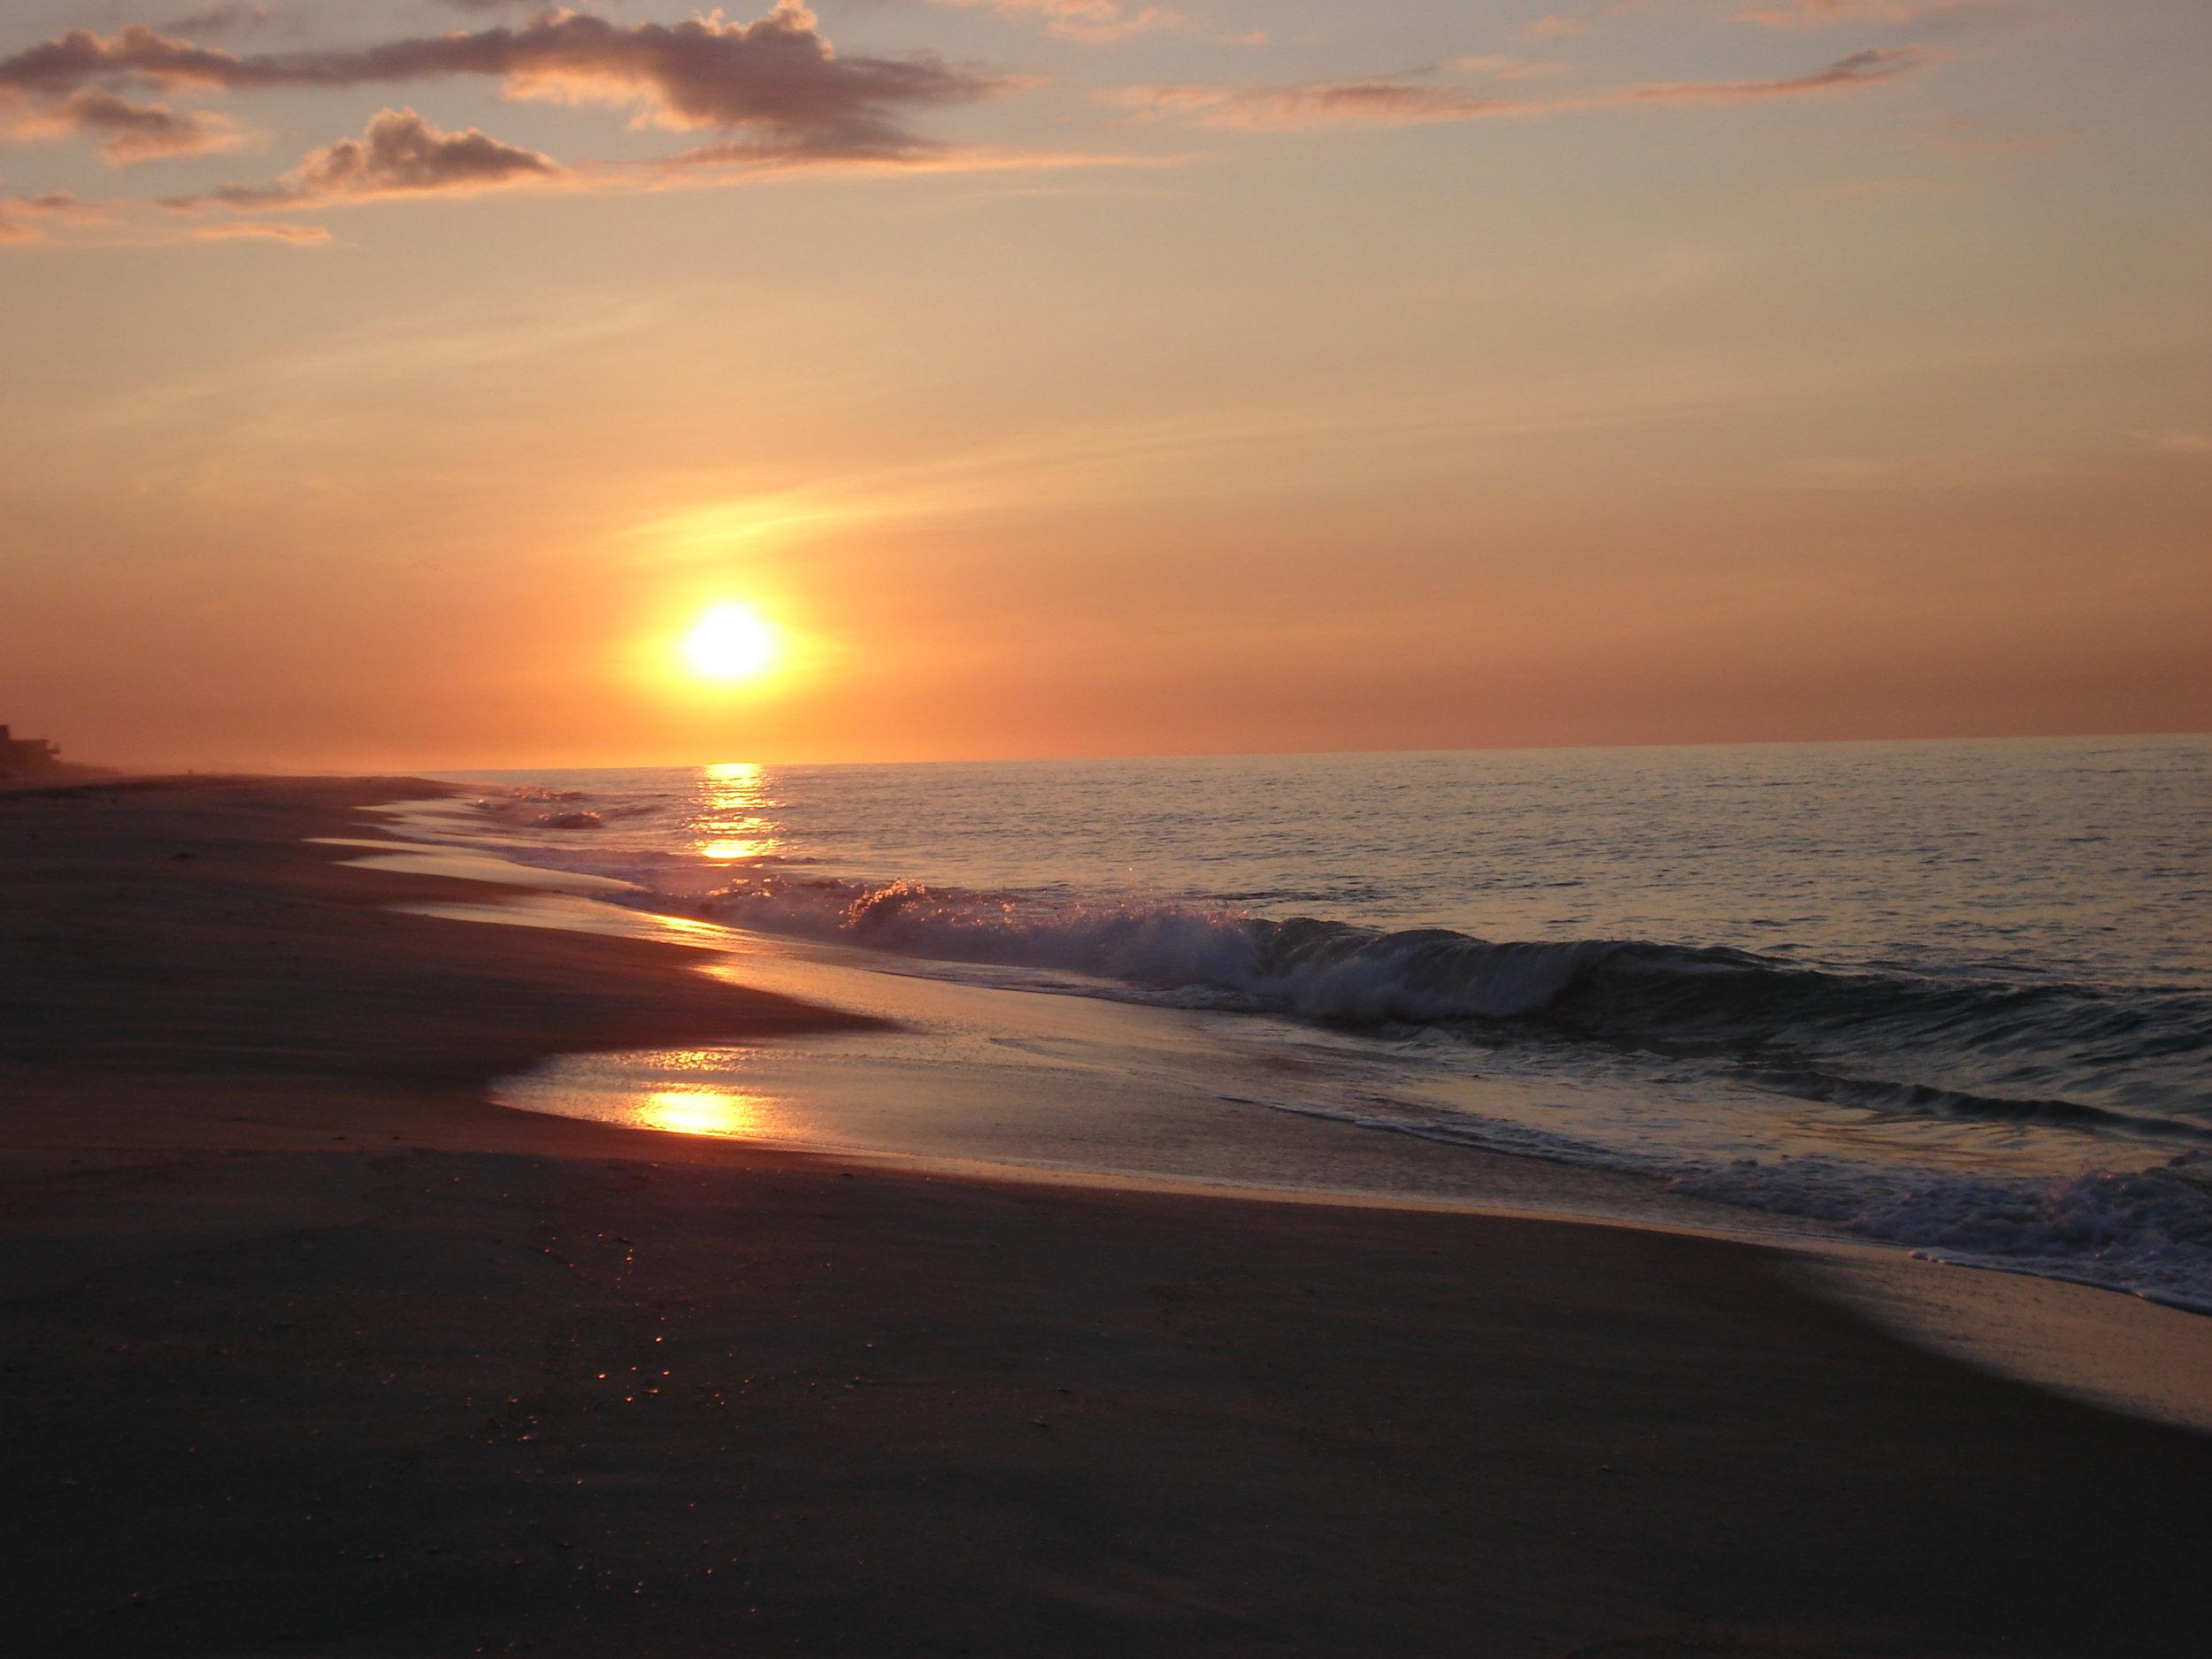 Fire Island sunsetdogs 2007 006.jpg